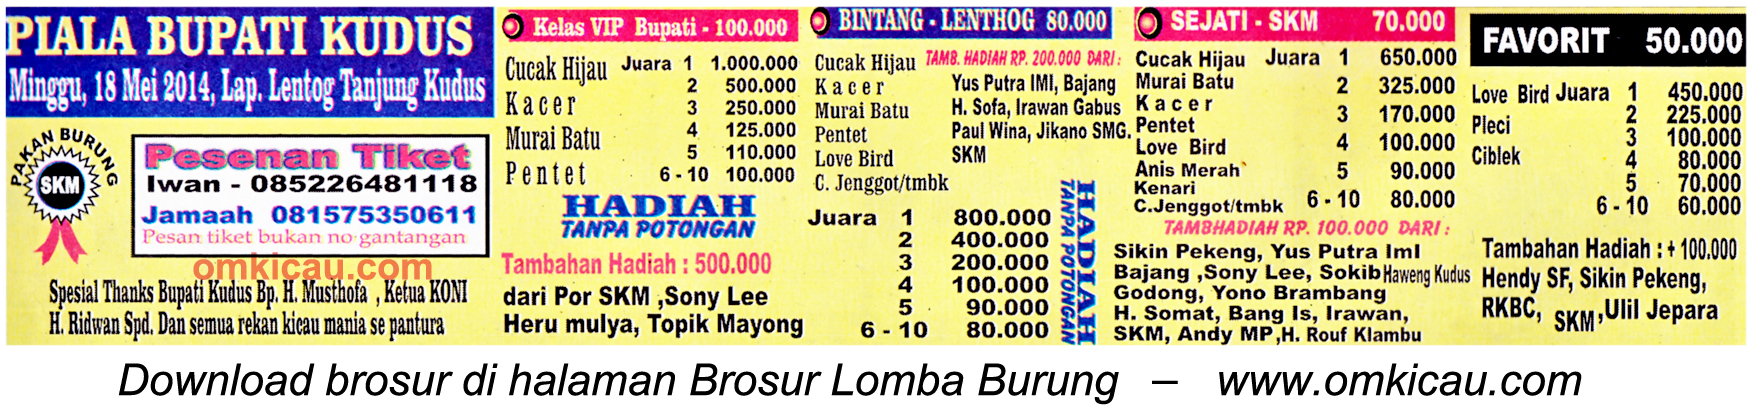 Brosur Lomba Burung Berkicau Piala Bupati Kudus, 18 Mei 2014